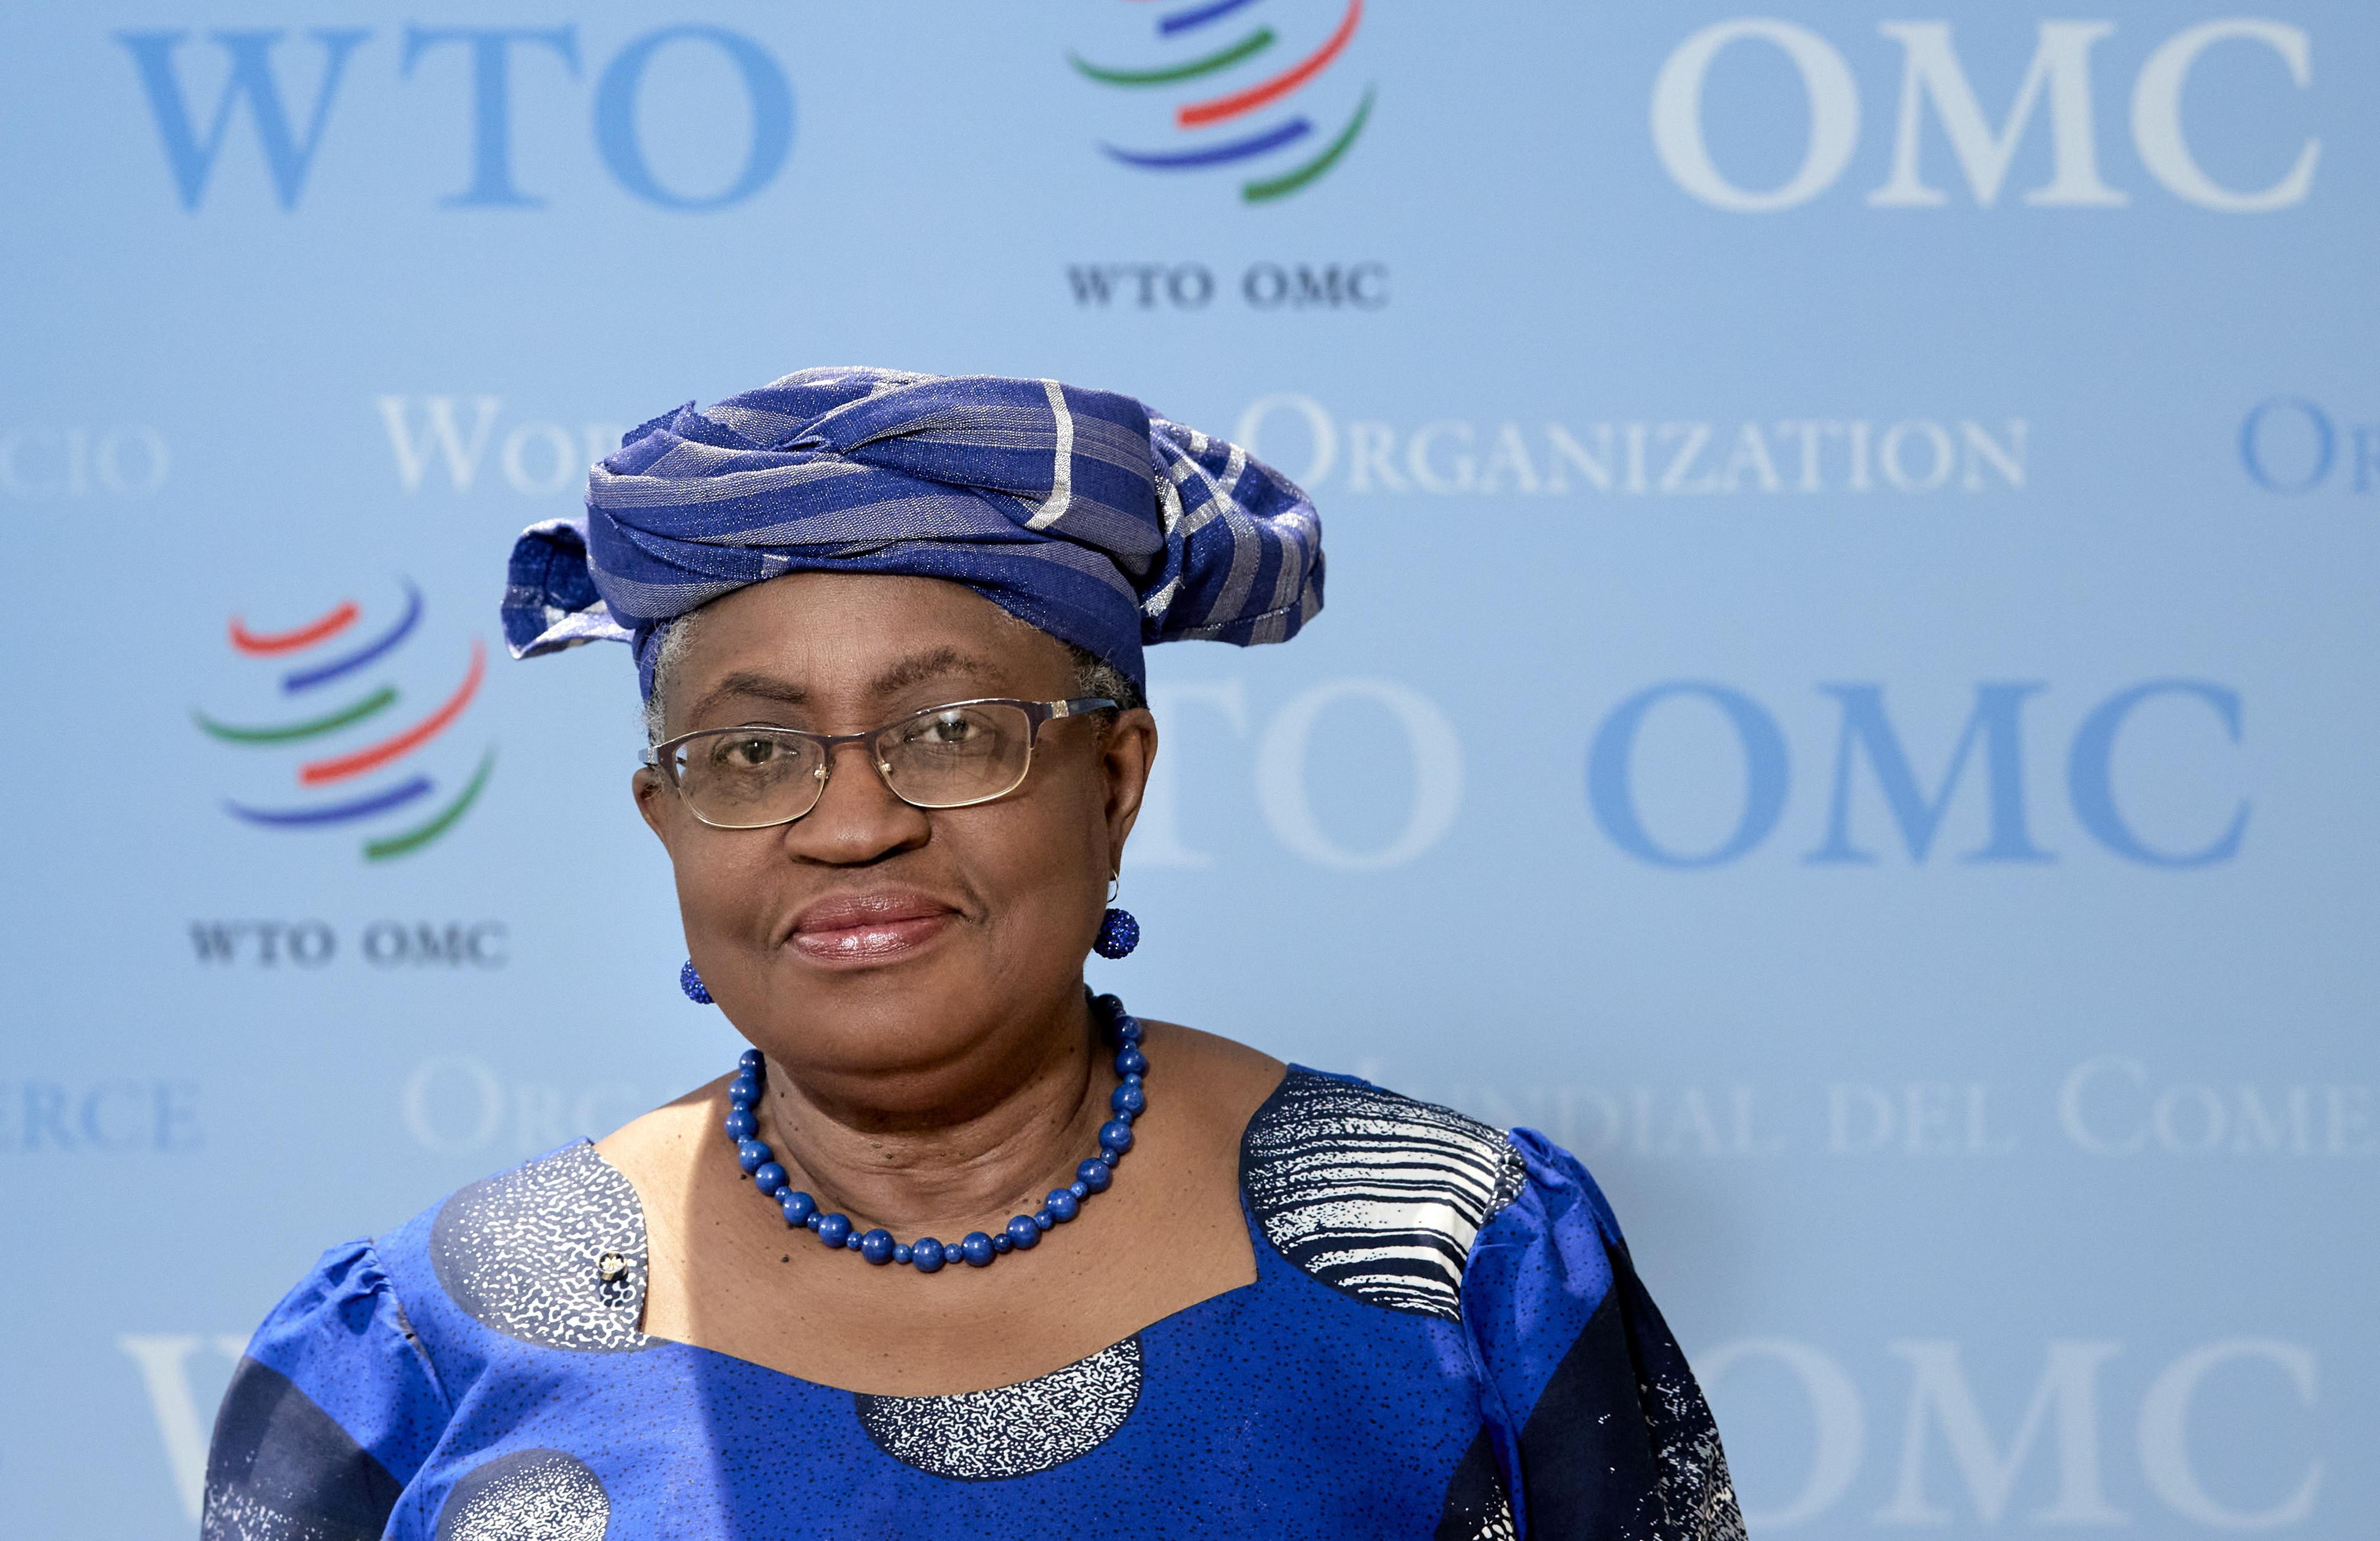 image of World Trade Organisation Director-General Ngozi Okonjo-Iweala